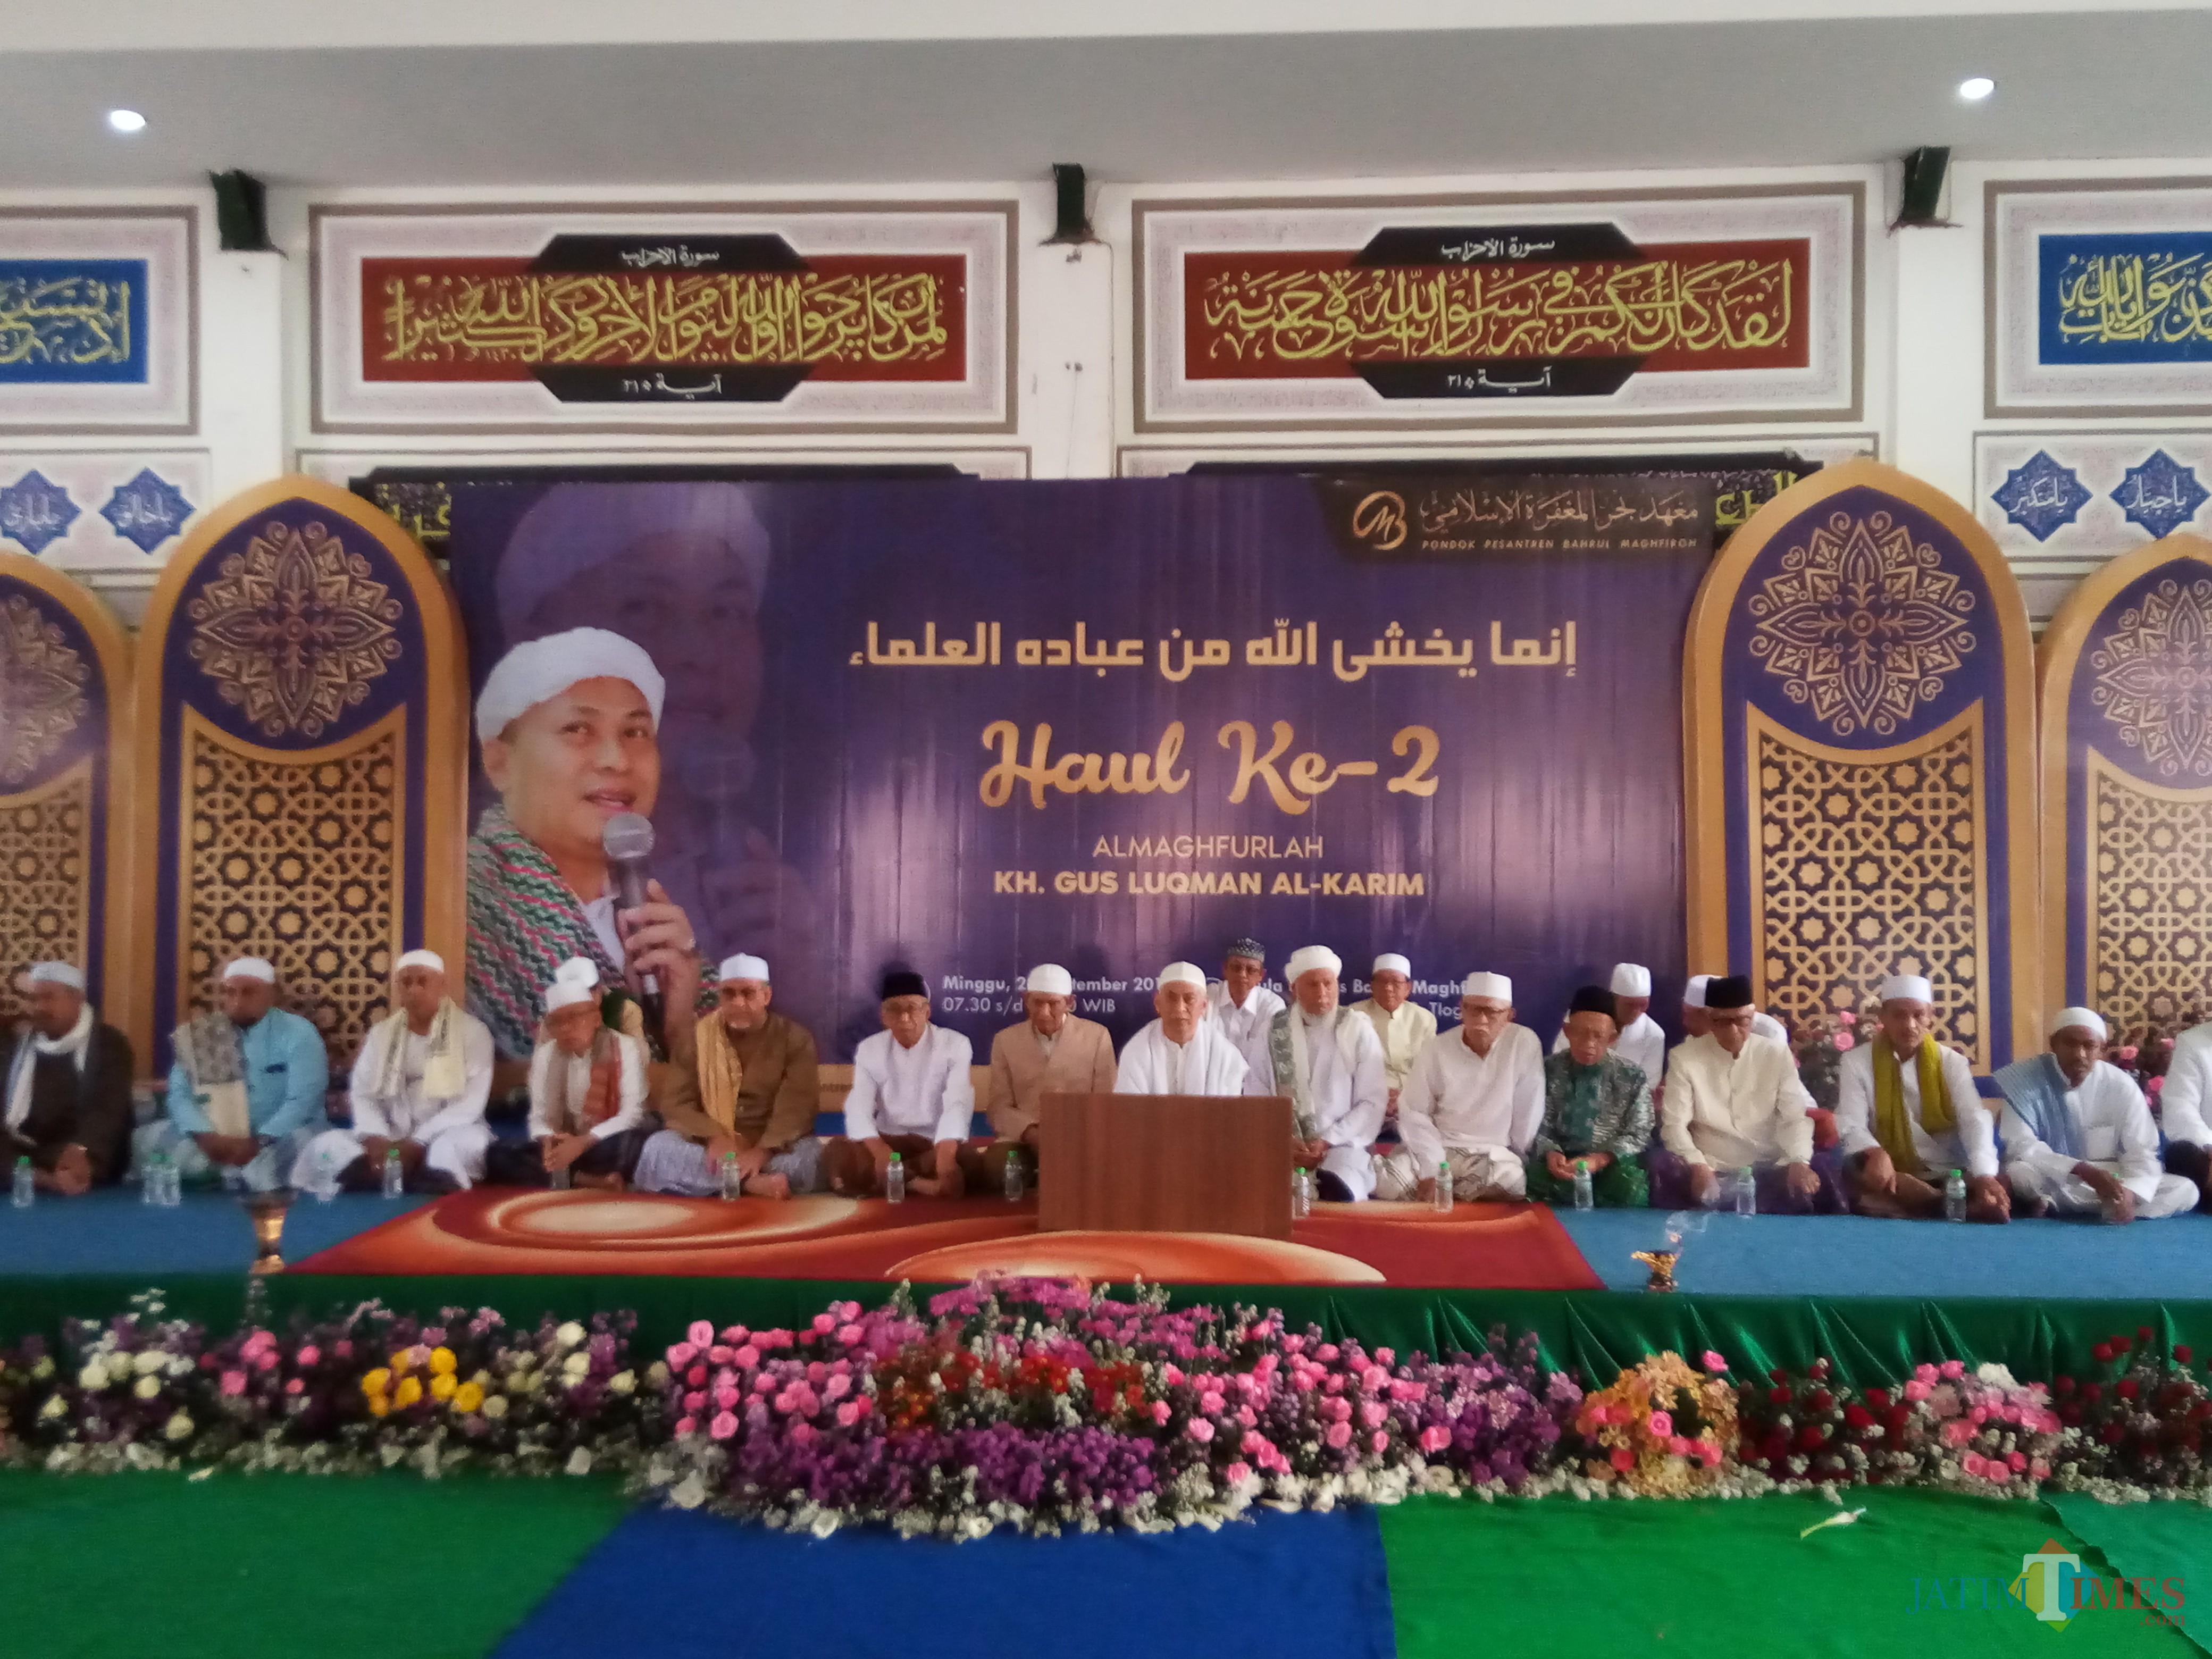 Suasana saat  para ulama membacakan doa pada Haul Ke-2 almaghfurlah KH Gus Lukman Al-Karim di Ponpes Bahrul Magfiroh.  (Anggara Sudiongko/MalangTIMESG